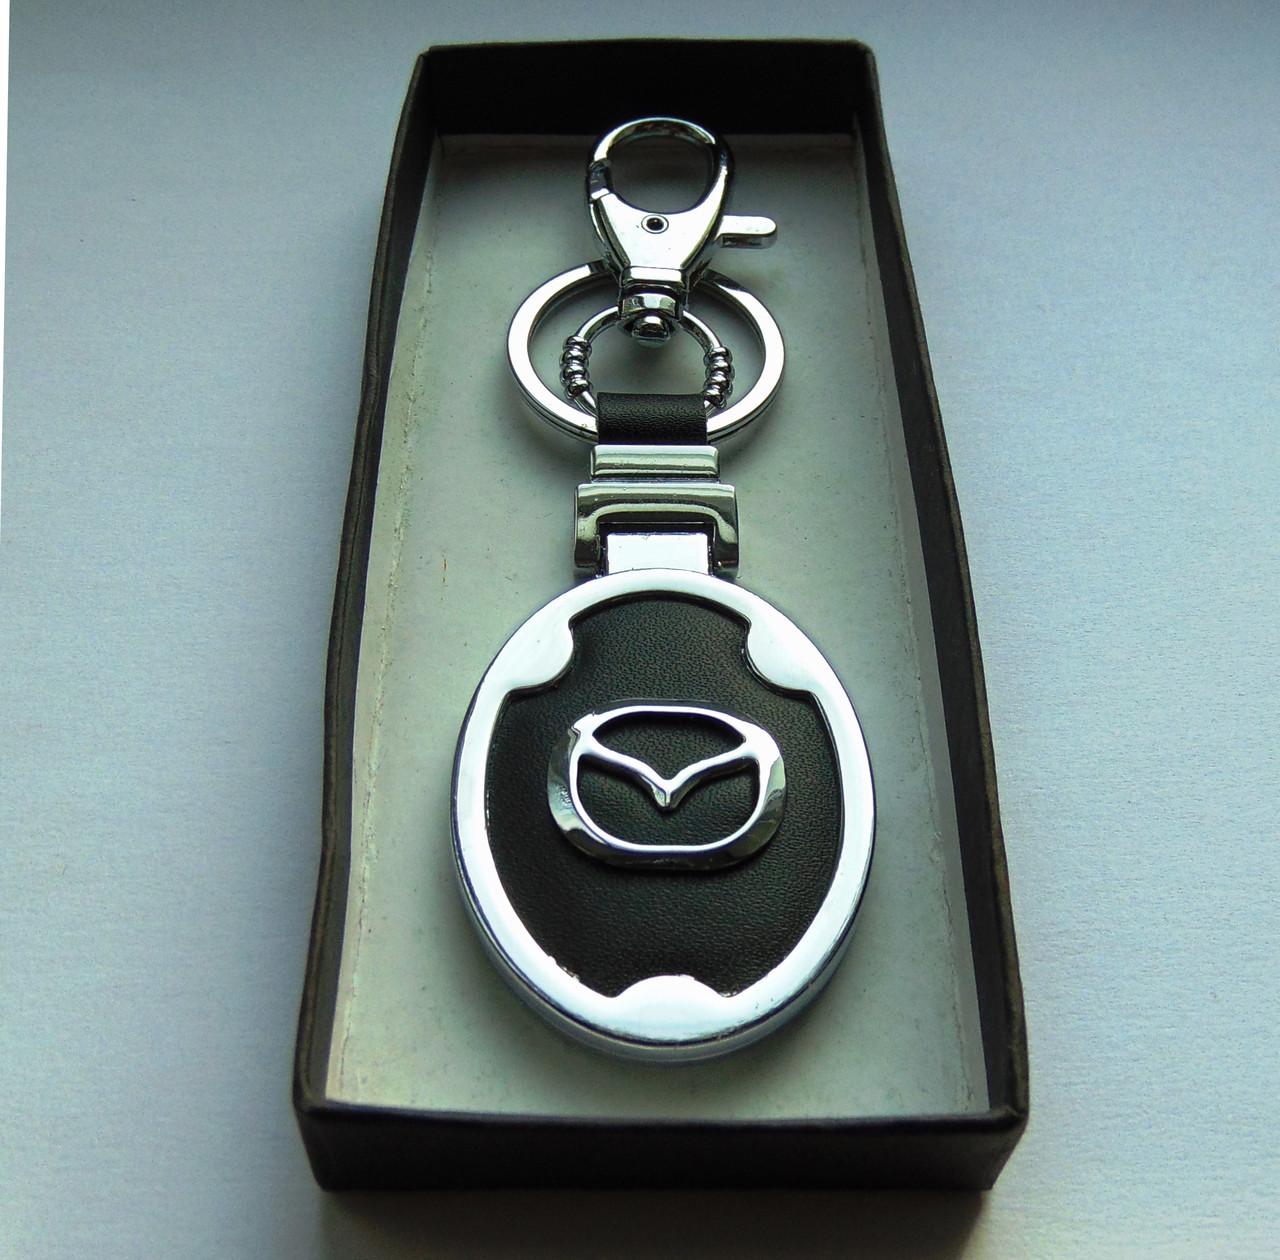 Автомобільний брелок Mazda (Мазда)